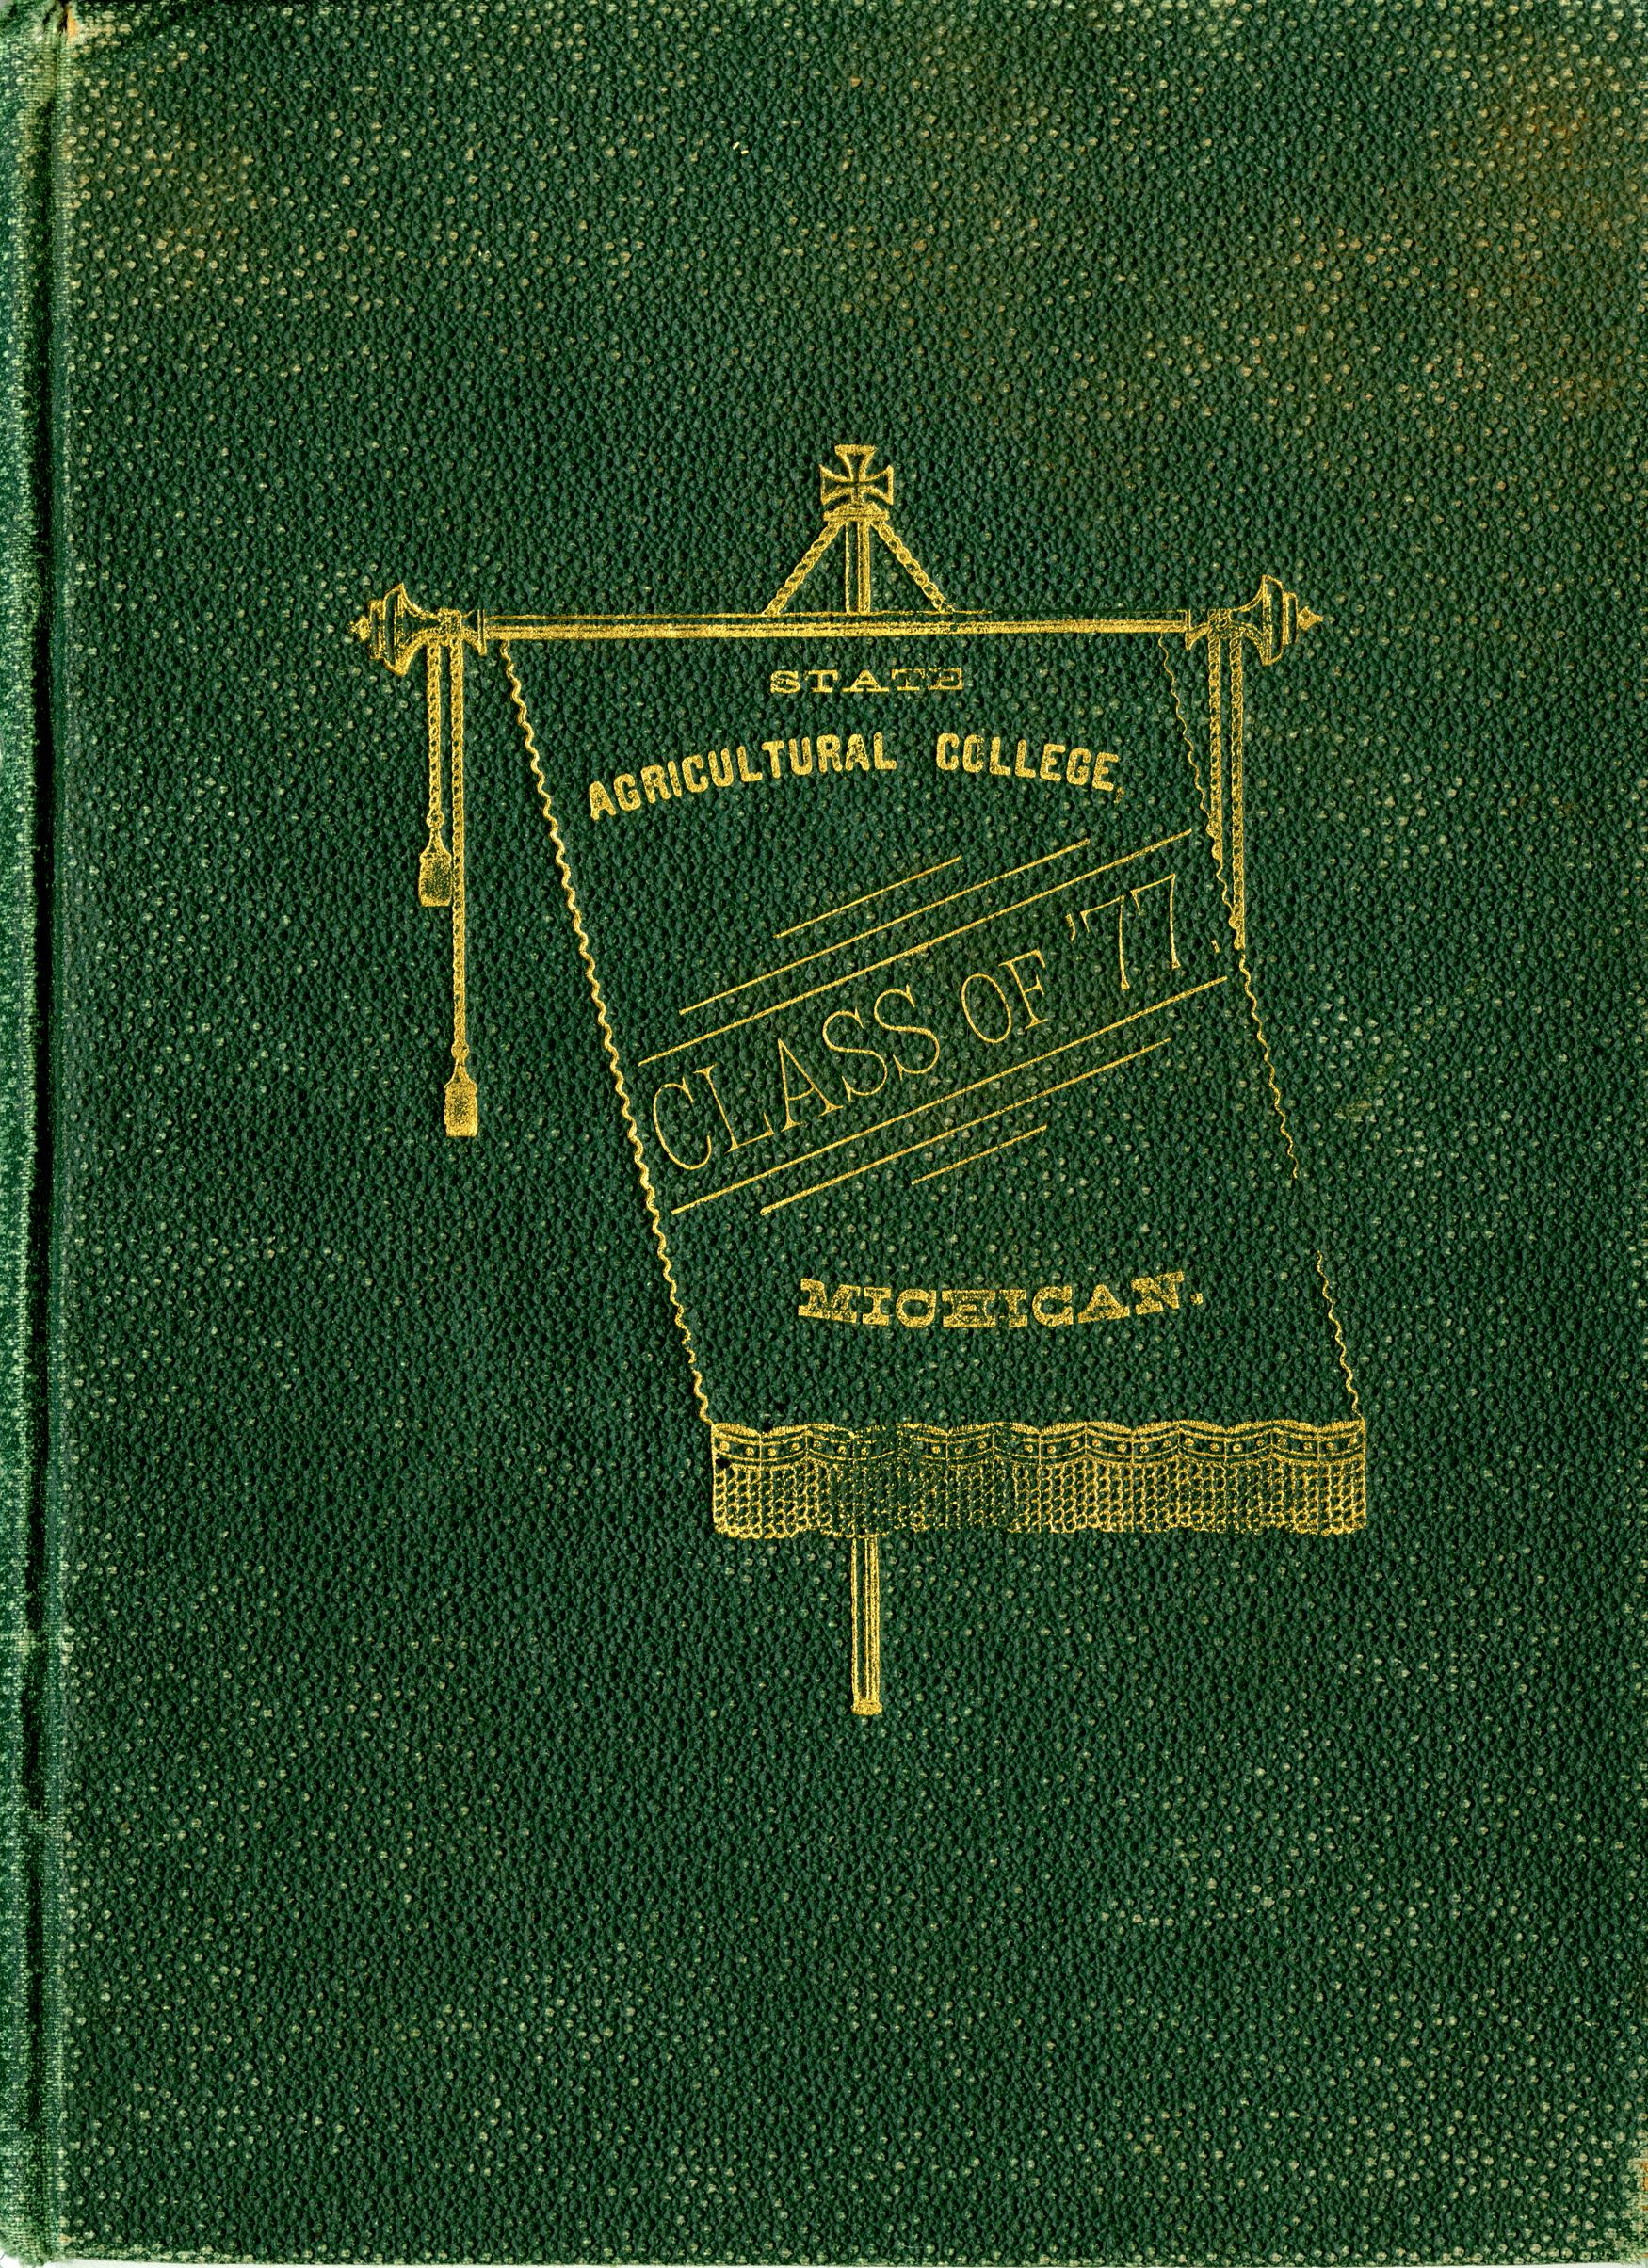 MSU Yearbook - Class Photo Album, 1877